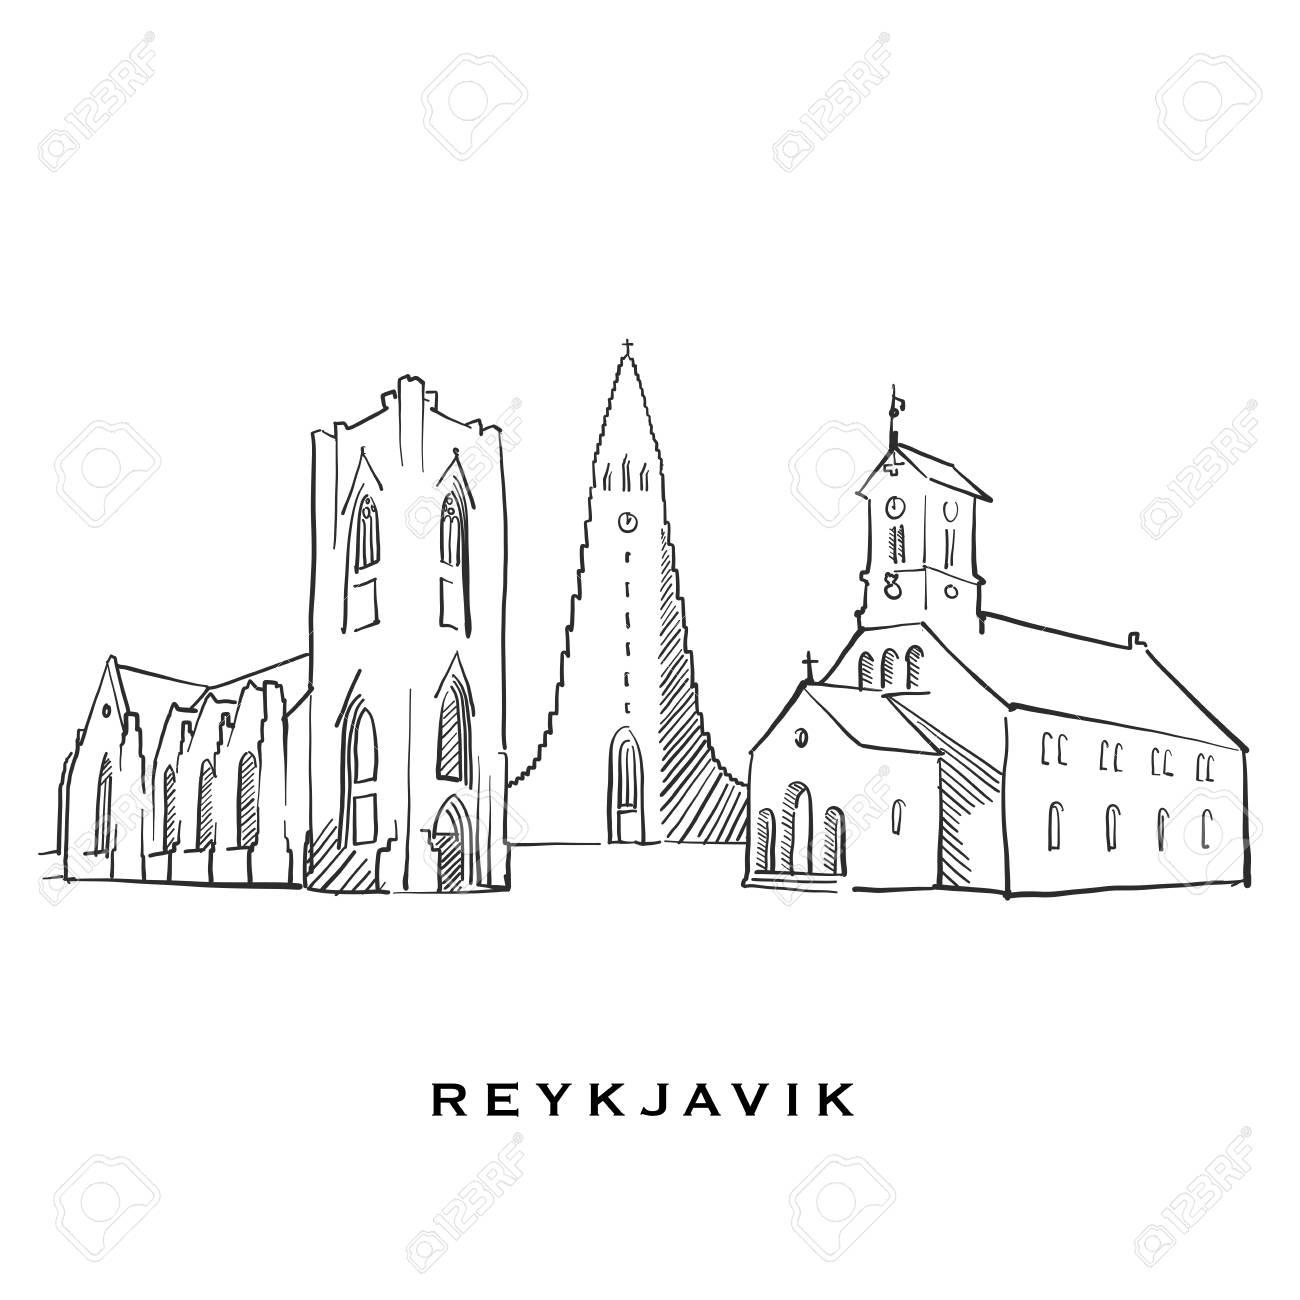 Reykjavik Iceland famous architecture  Outlined vector sketch